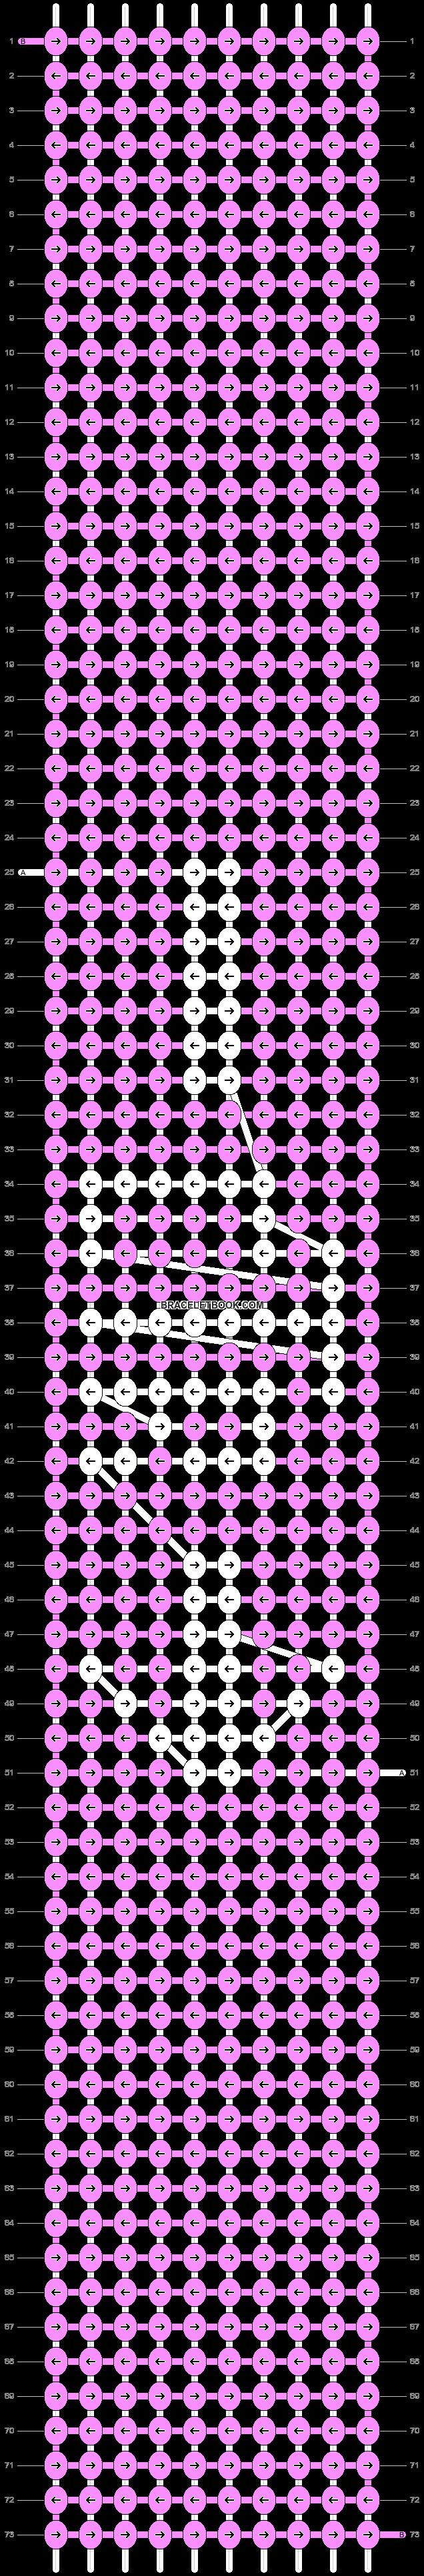 Alpha pattern #62438 pattern